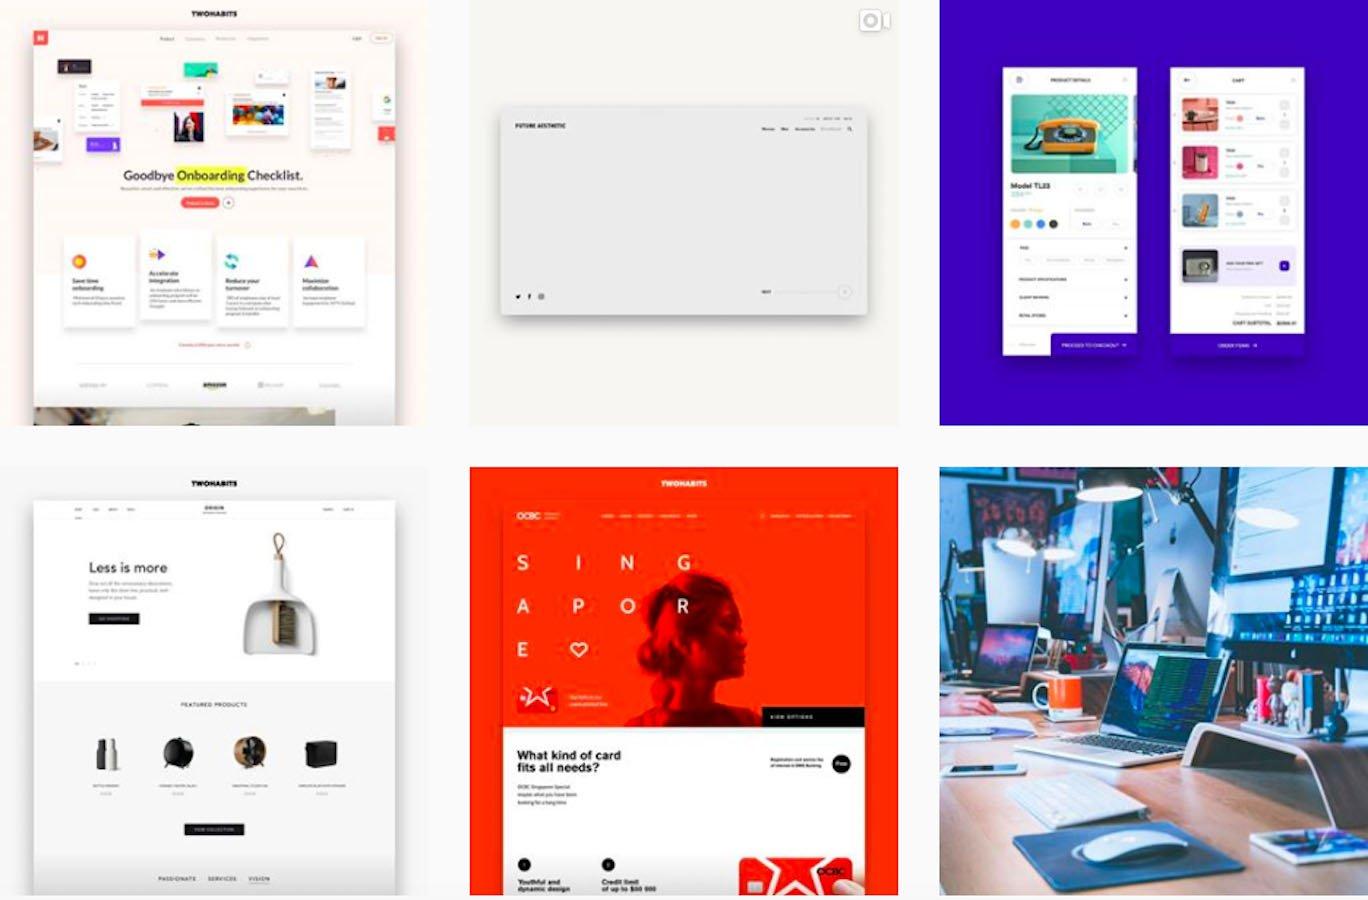 Web Design Inspiration: 110+ Accounts On Instagram and 10+ Best UX & Web Design Books in 2020 - twohabitsdesign